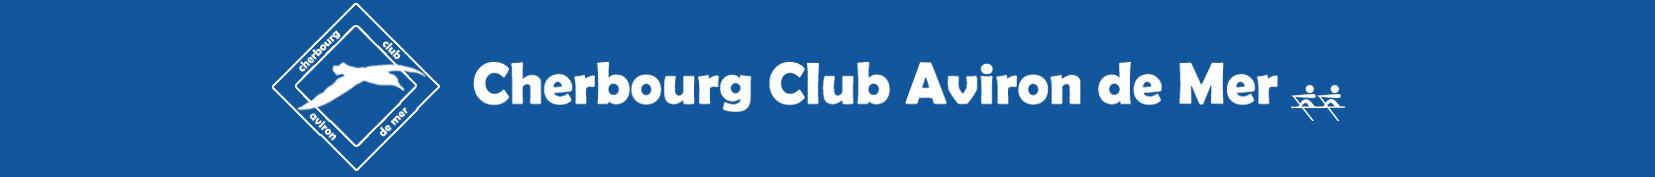 Cherbourg Club Aviron De Mer